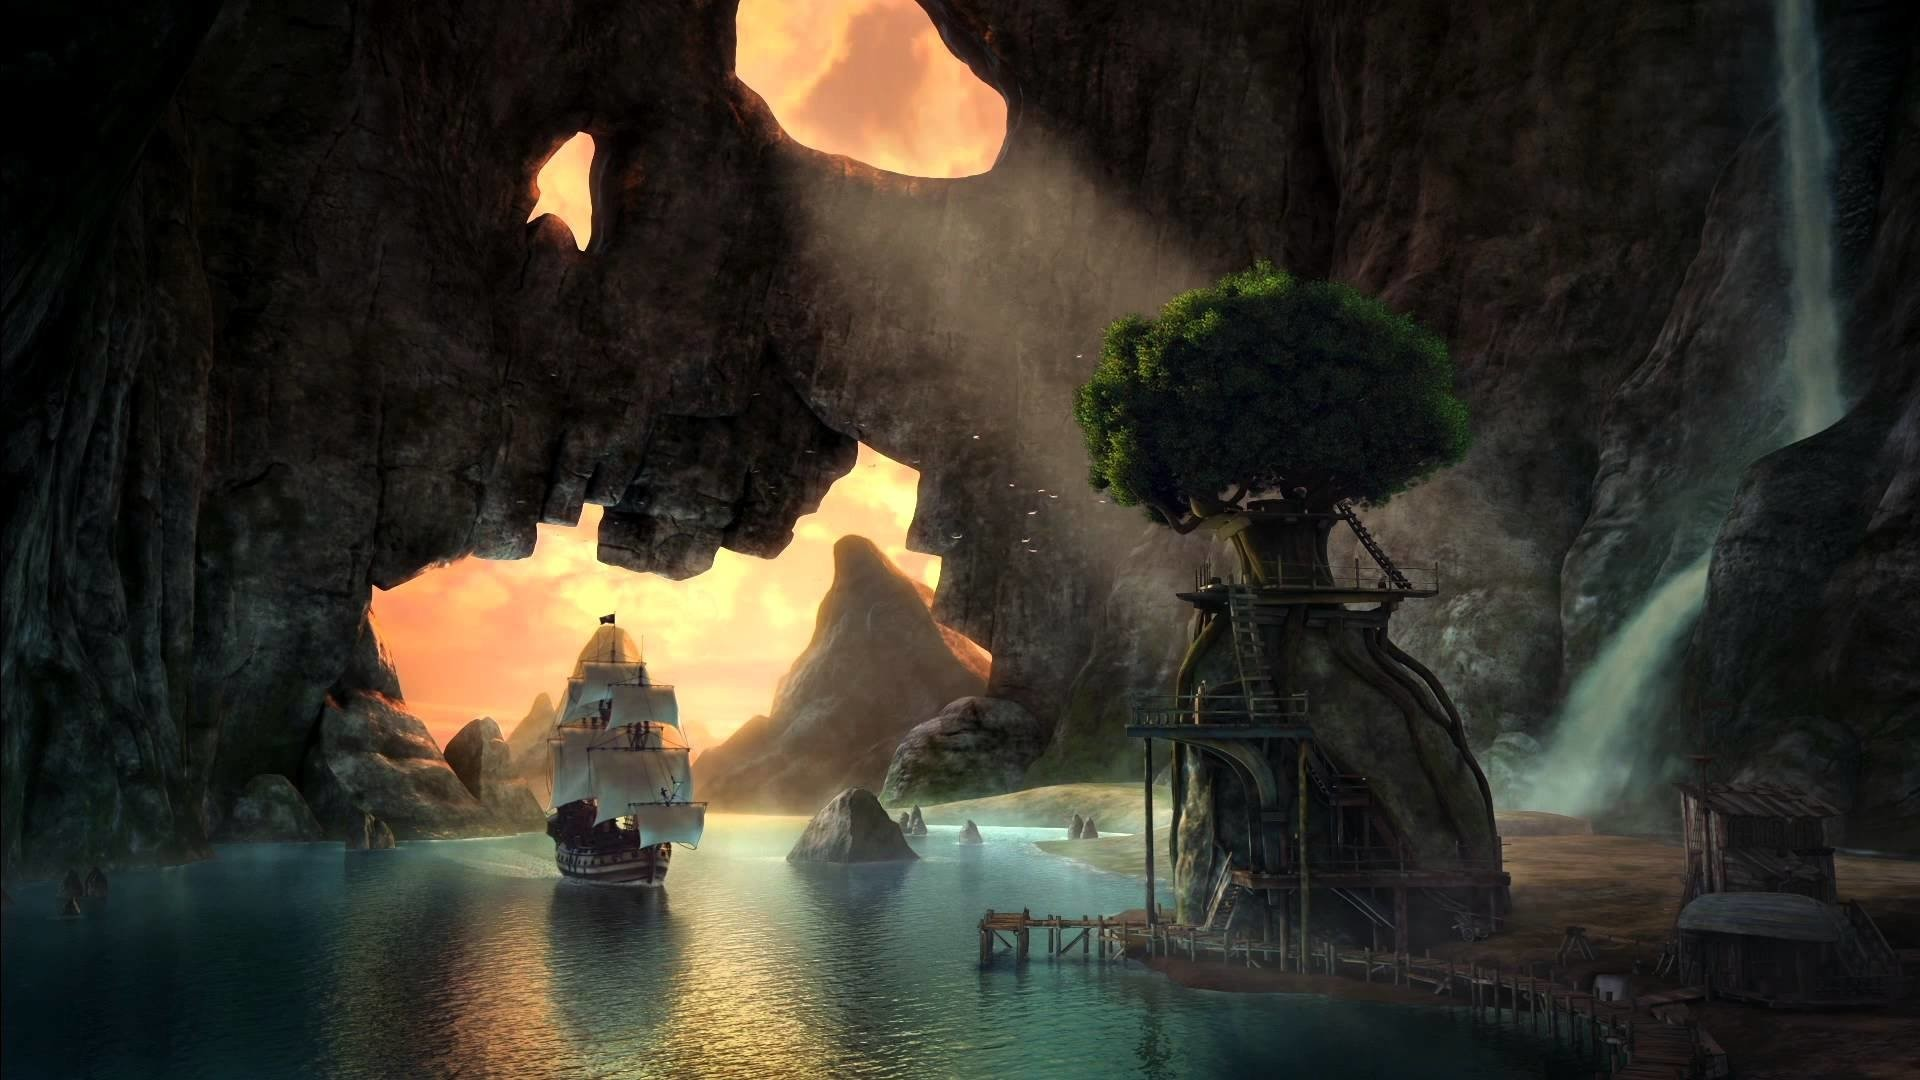 Movie – The Pirate Fairy Pirate Ship Wallpaper